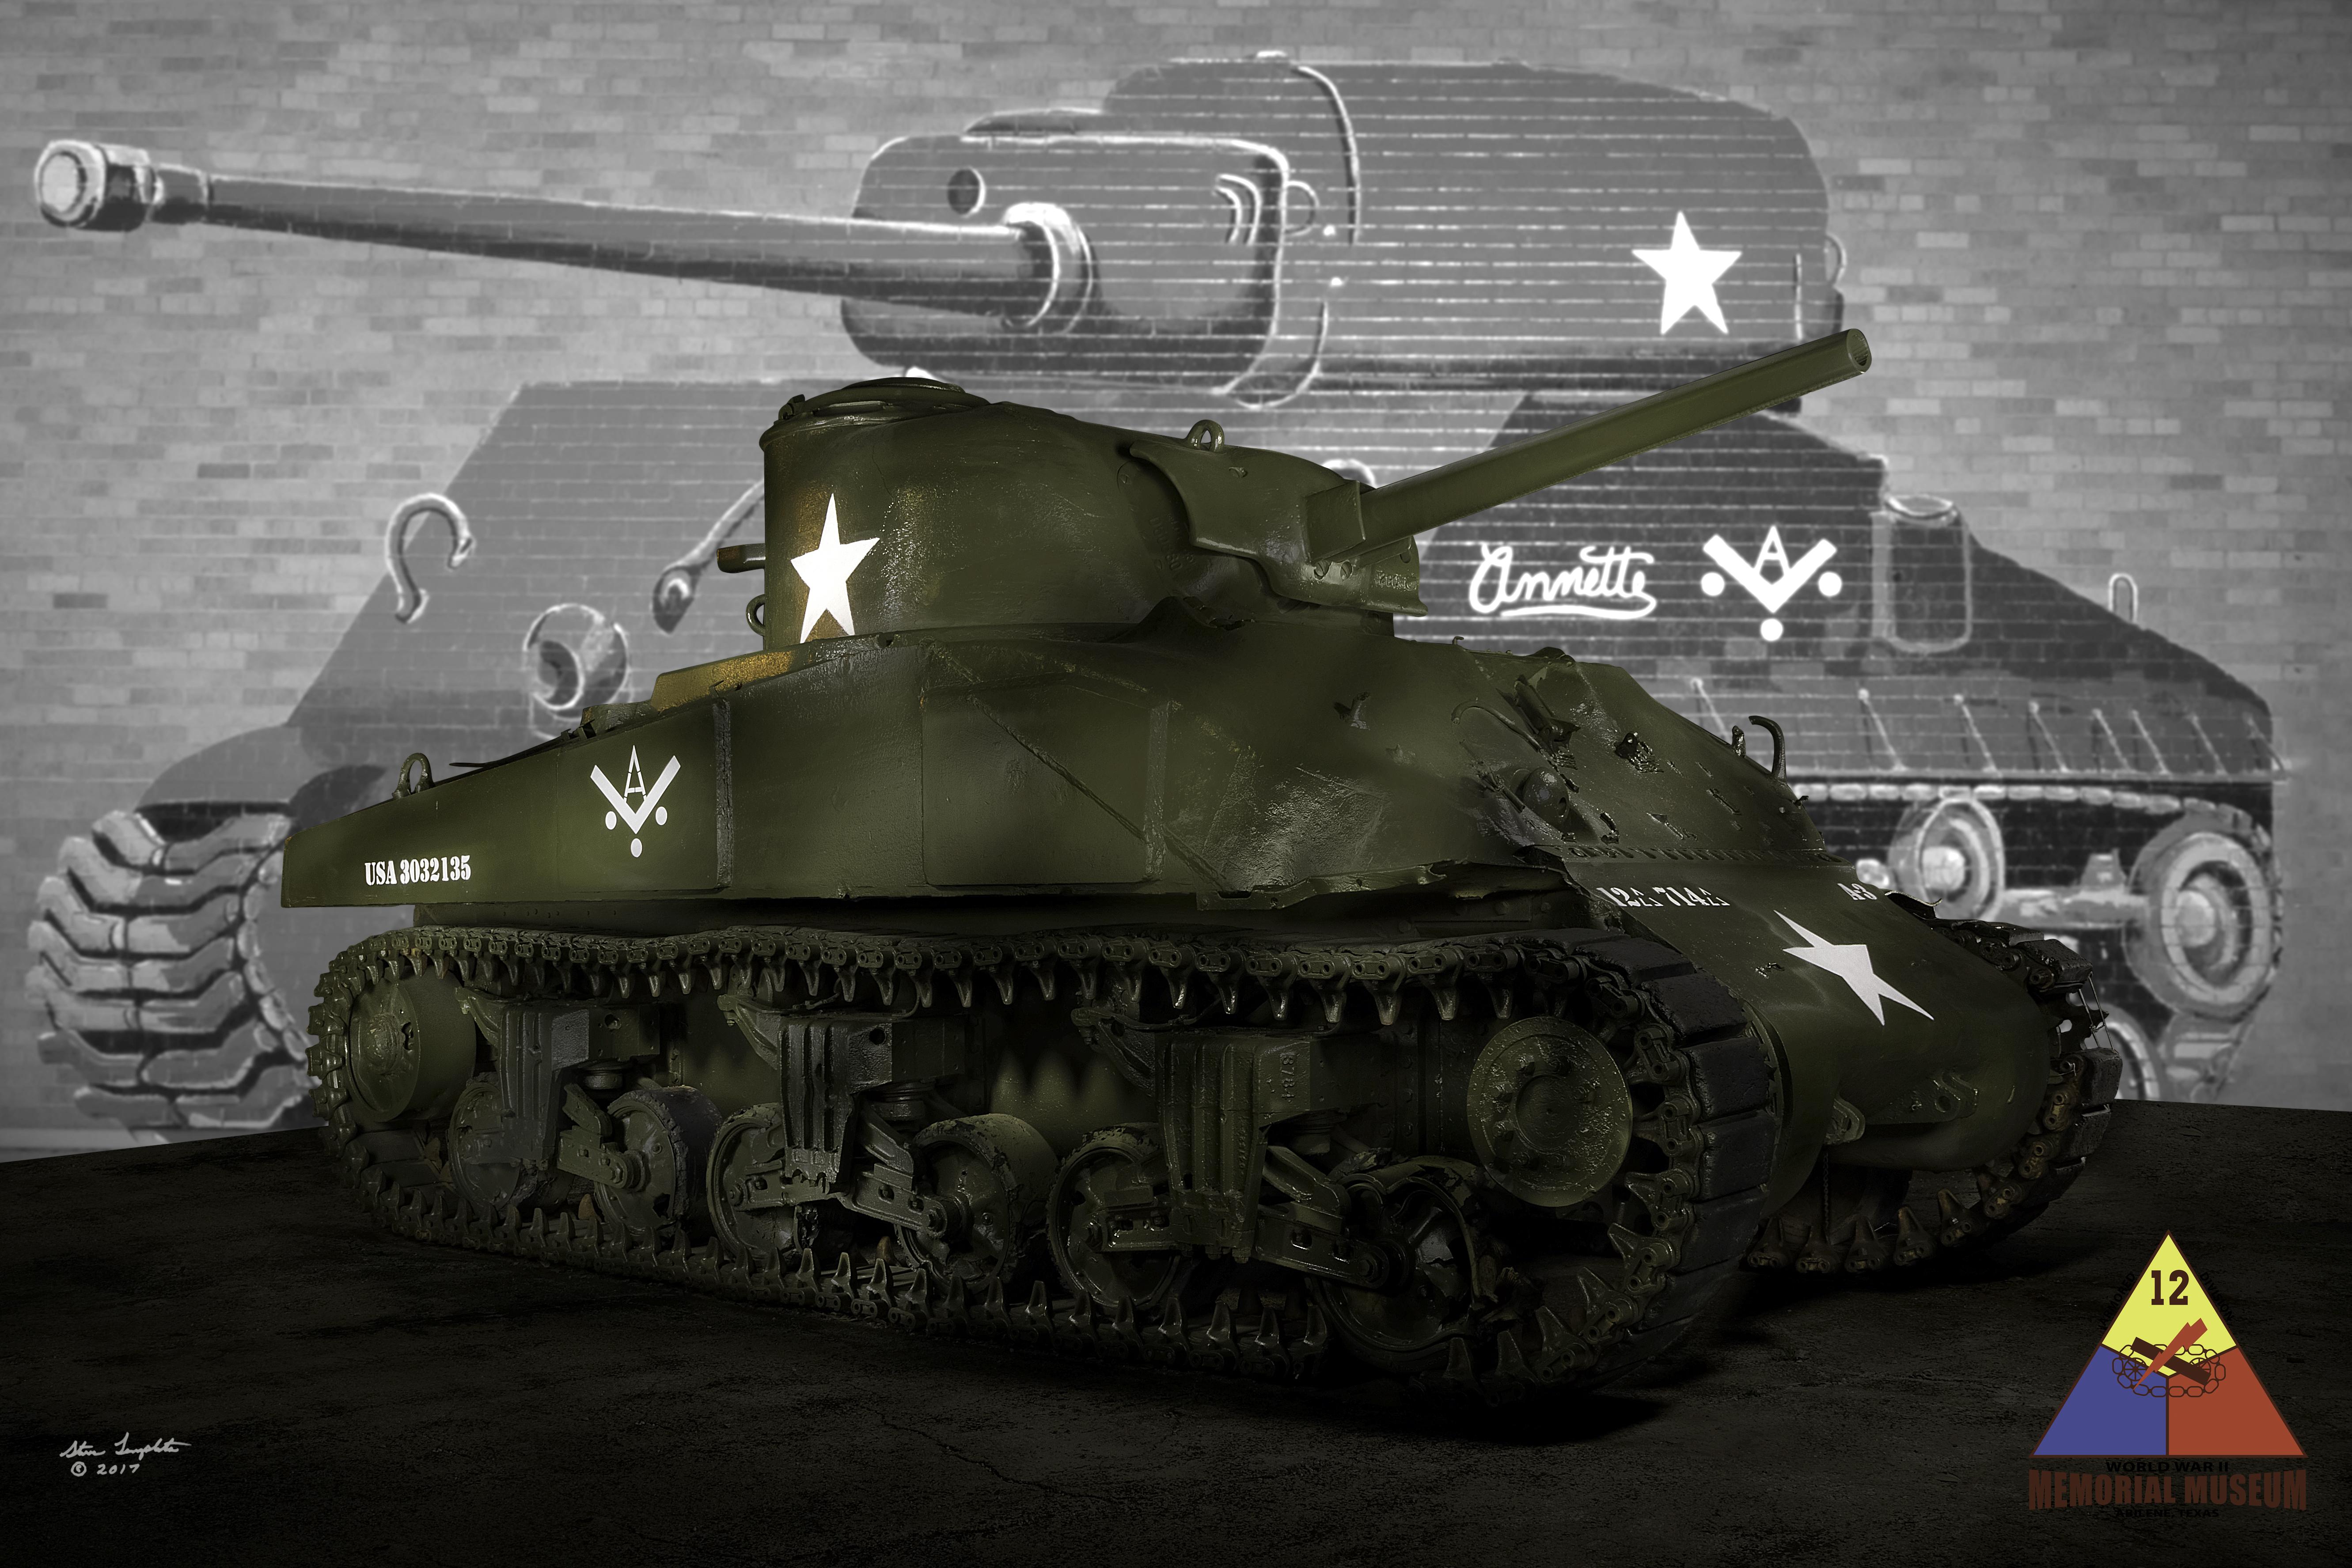 12th Armored Division Memorial Museum